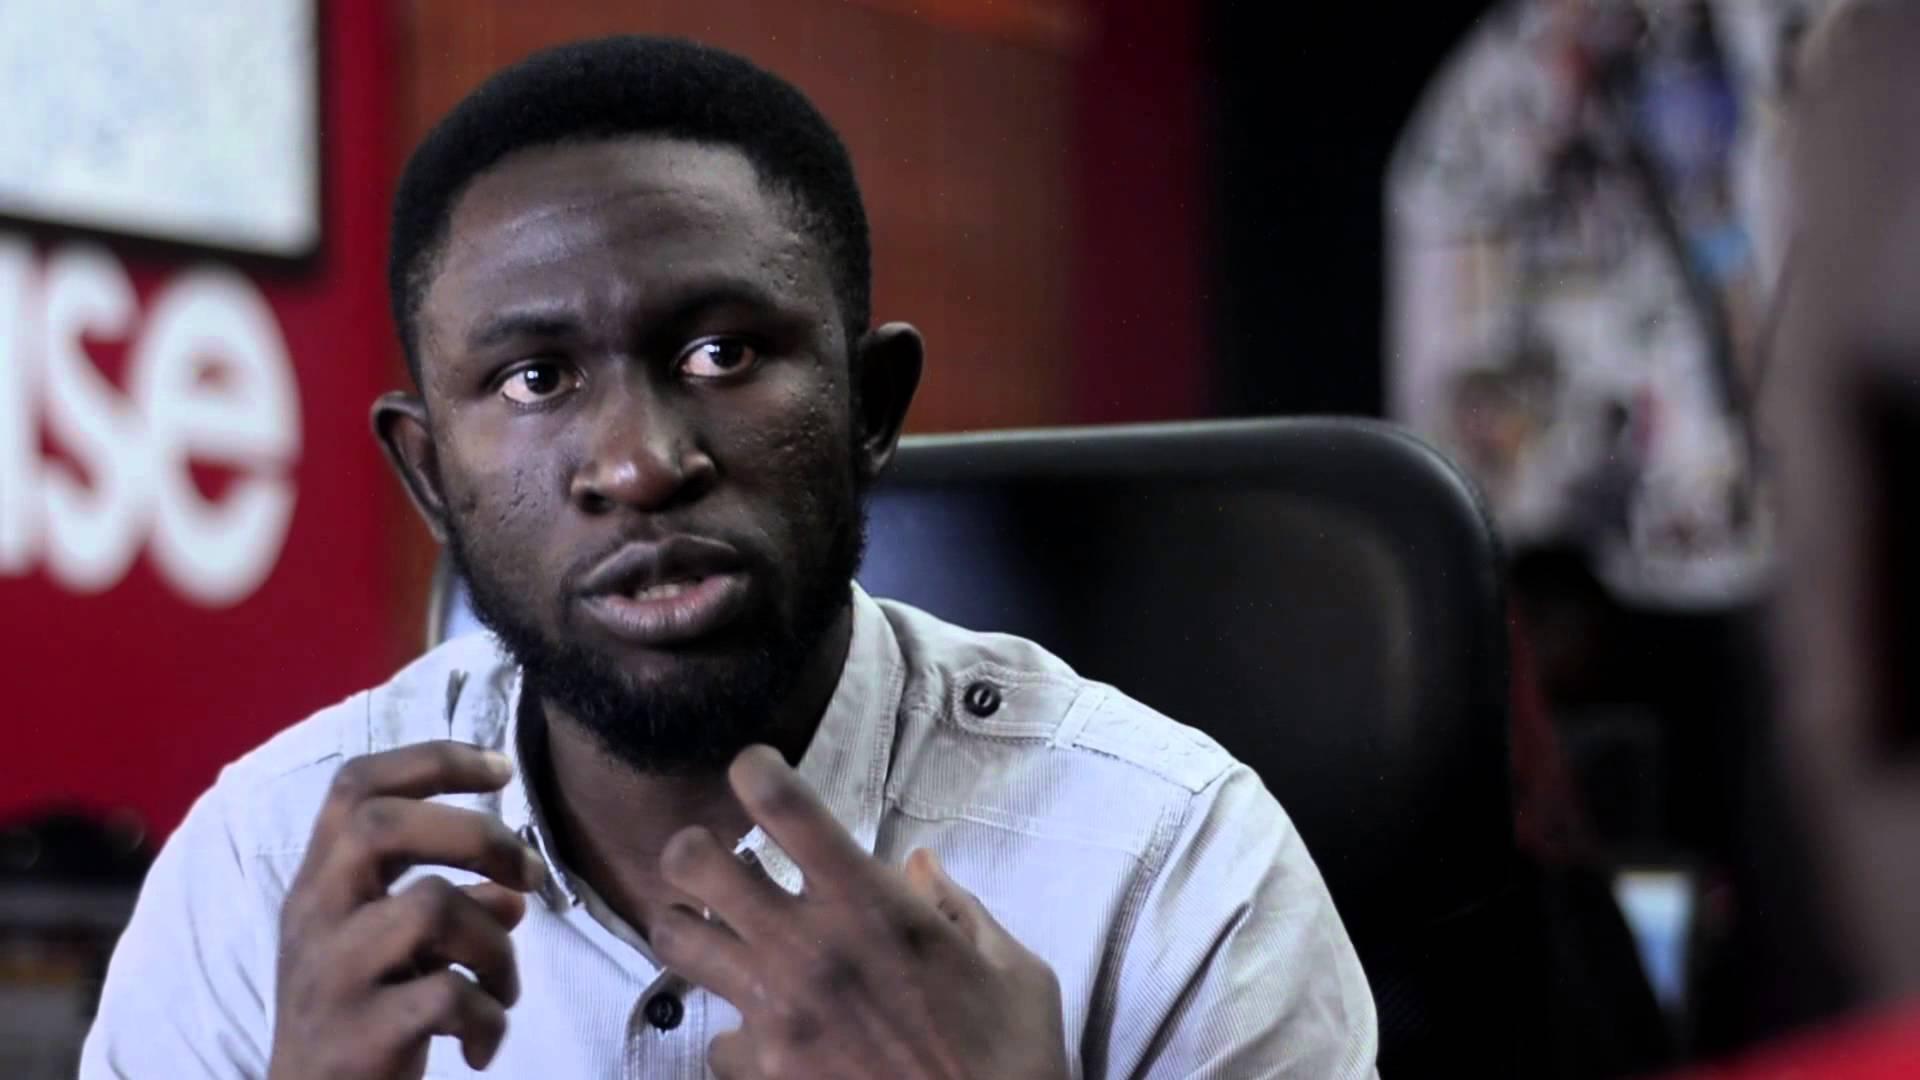 Osagie Alonge Alleges Death Threats As Loosetalk Podcast Crew Take Down Controversial Wizkid Episode